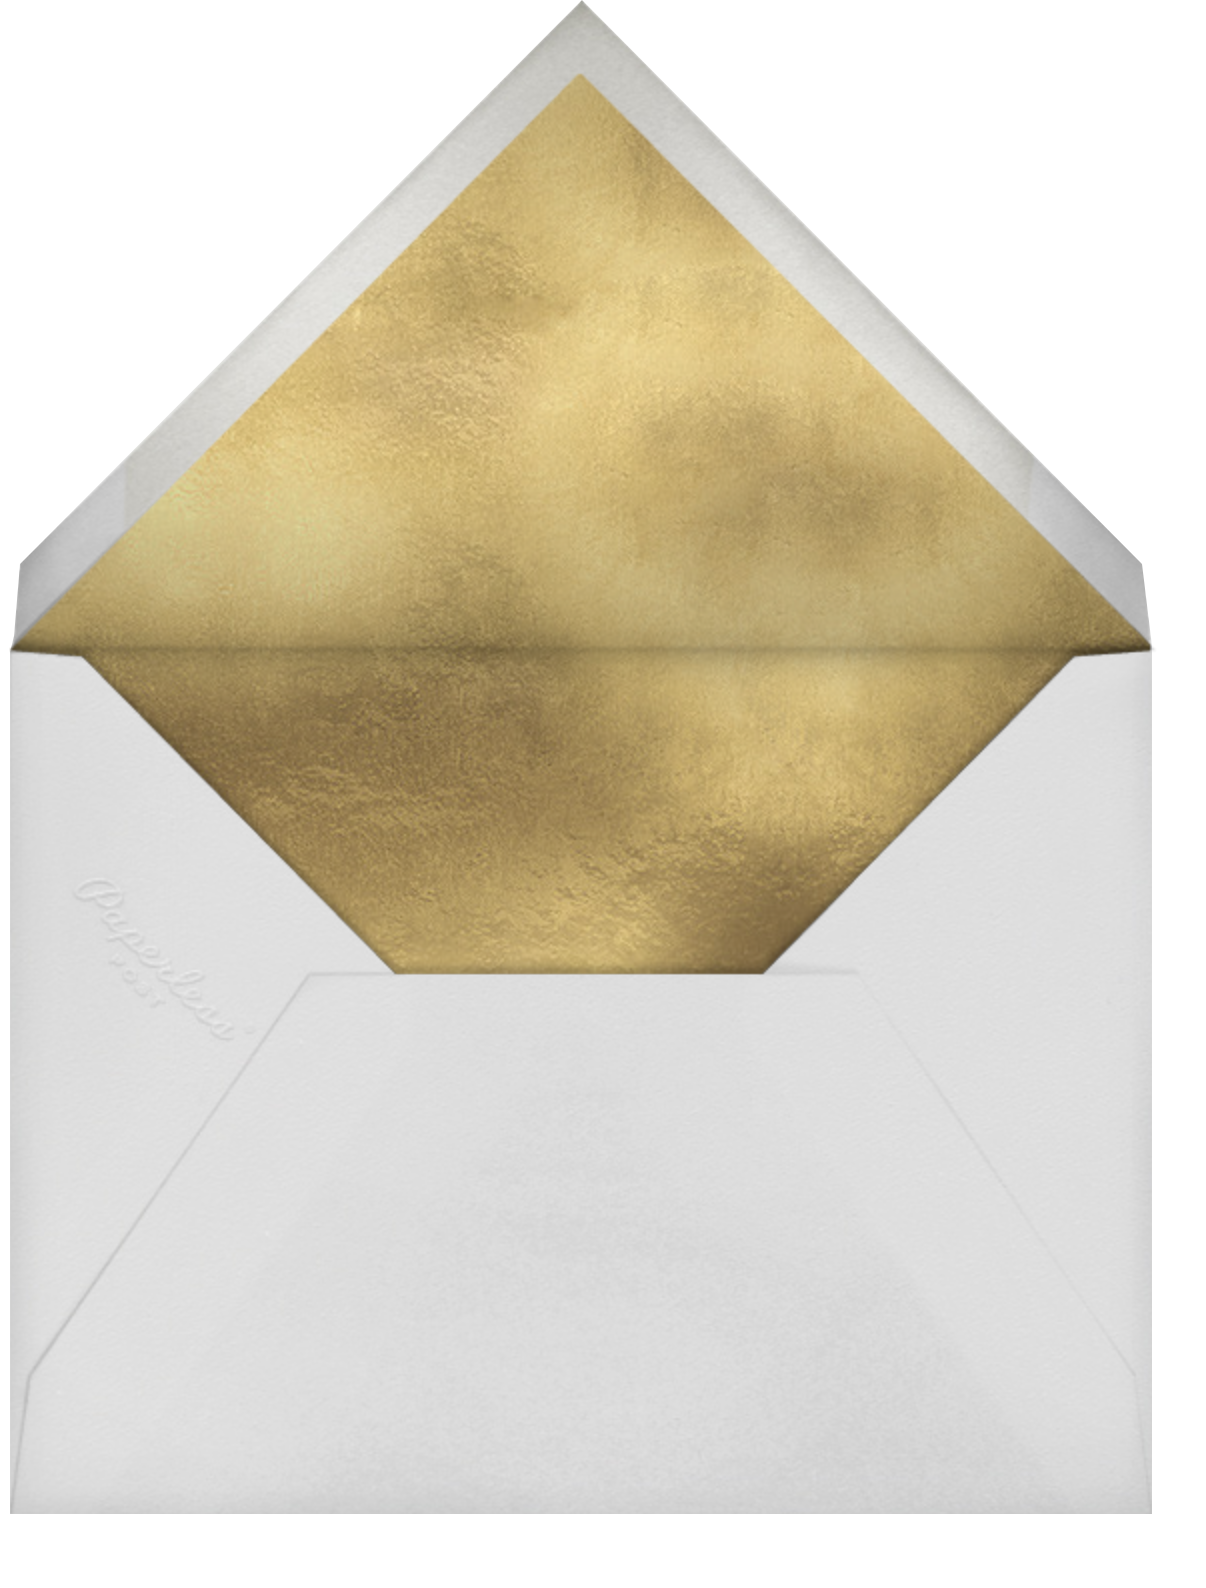 Embossed Daisies - Yellow - kate spade new york - Envelope